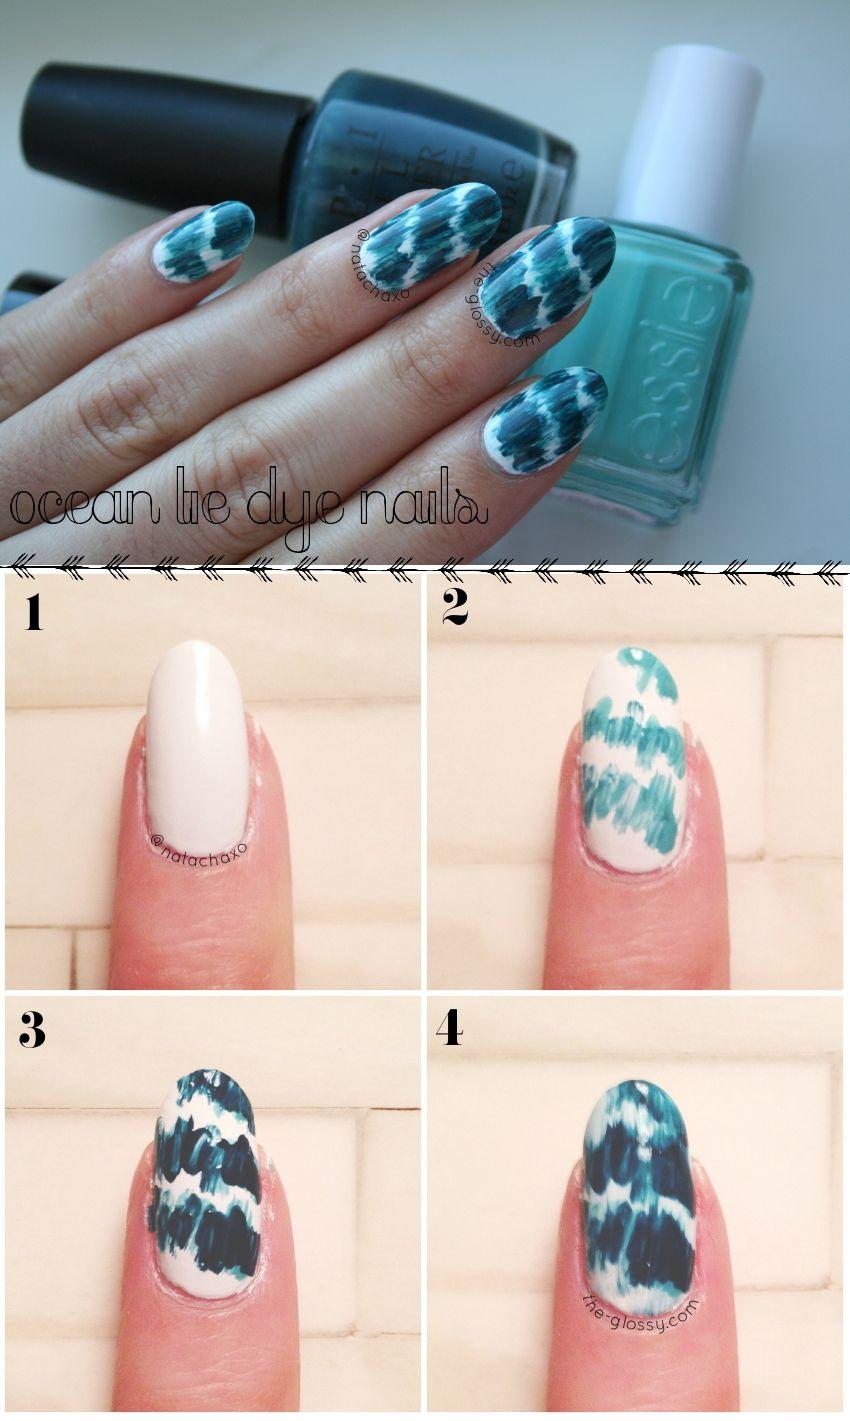 Ocean Tie Dye Nail Art Tutorial In Four Simple Steps Click Through